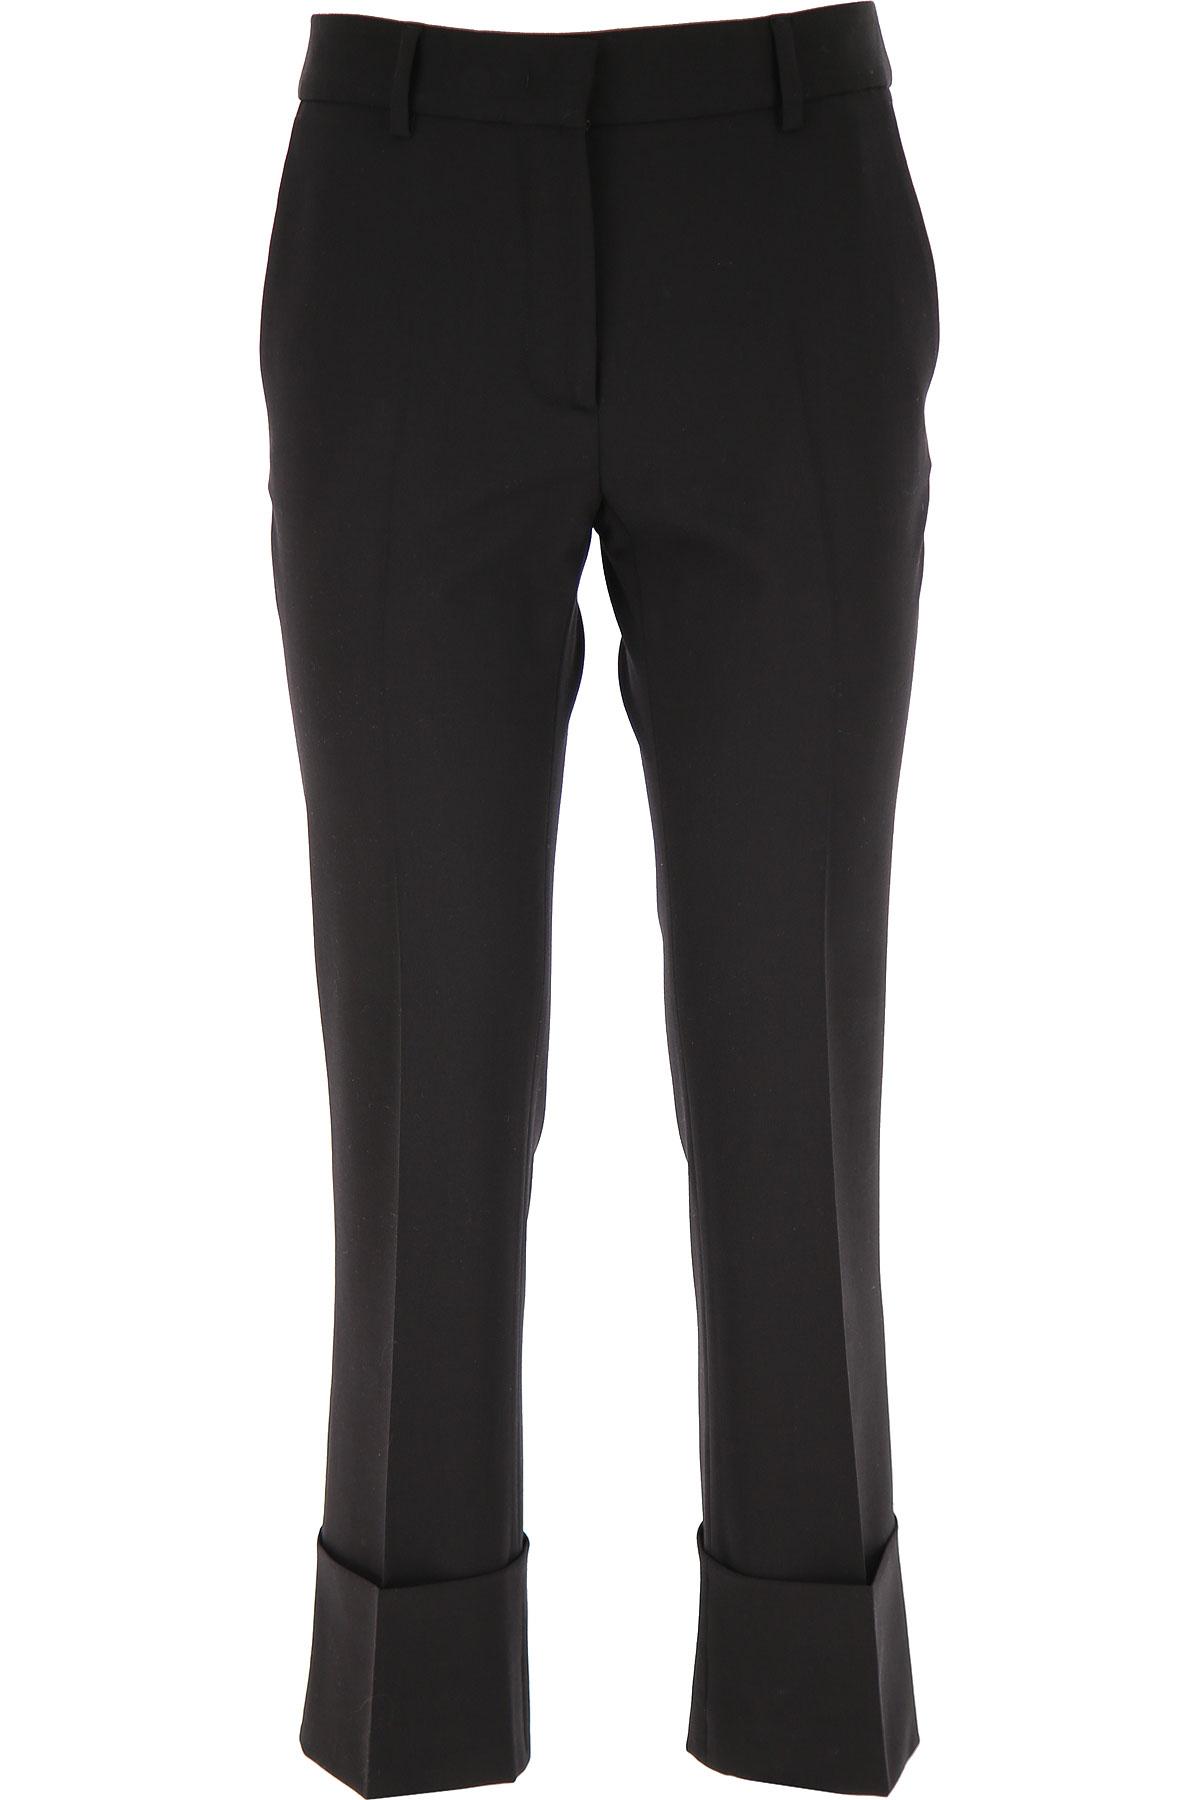 Alberto Biani Pants for Women On Sale, Black, fleece wool, 2019, 26